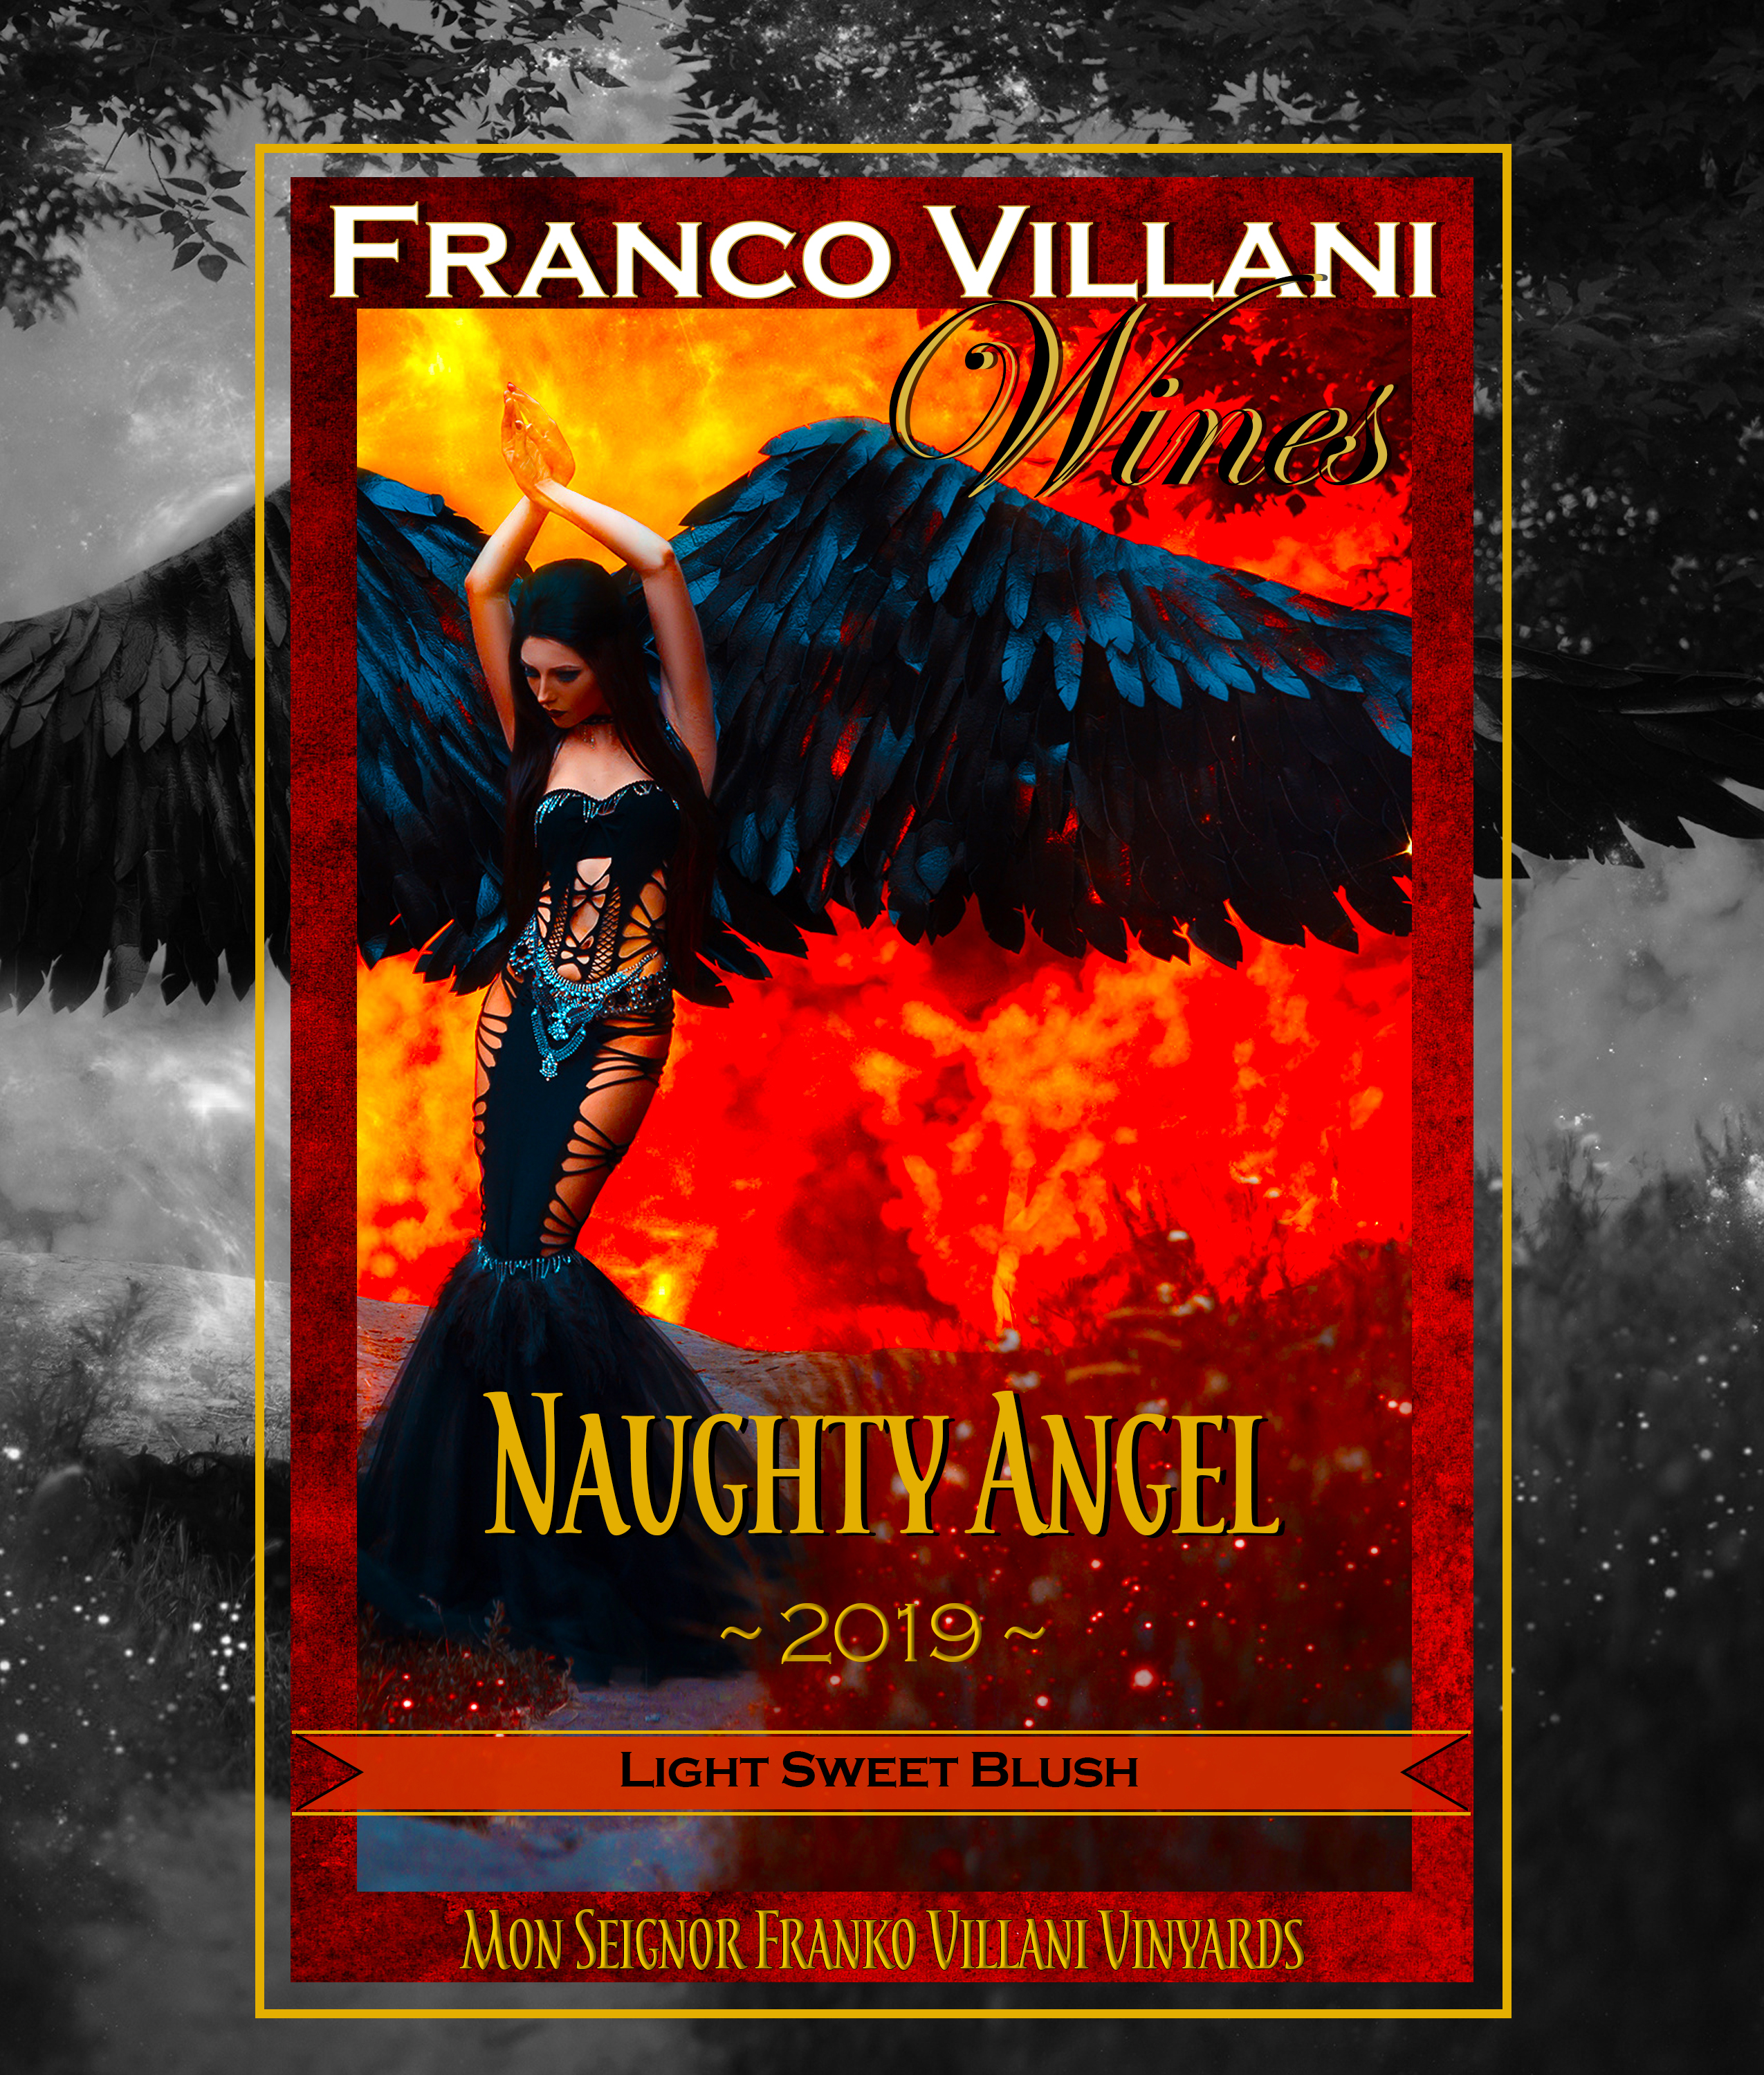 Franco Villani -Naughty-Angel